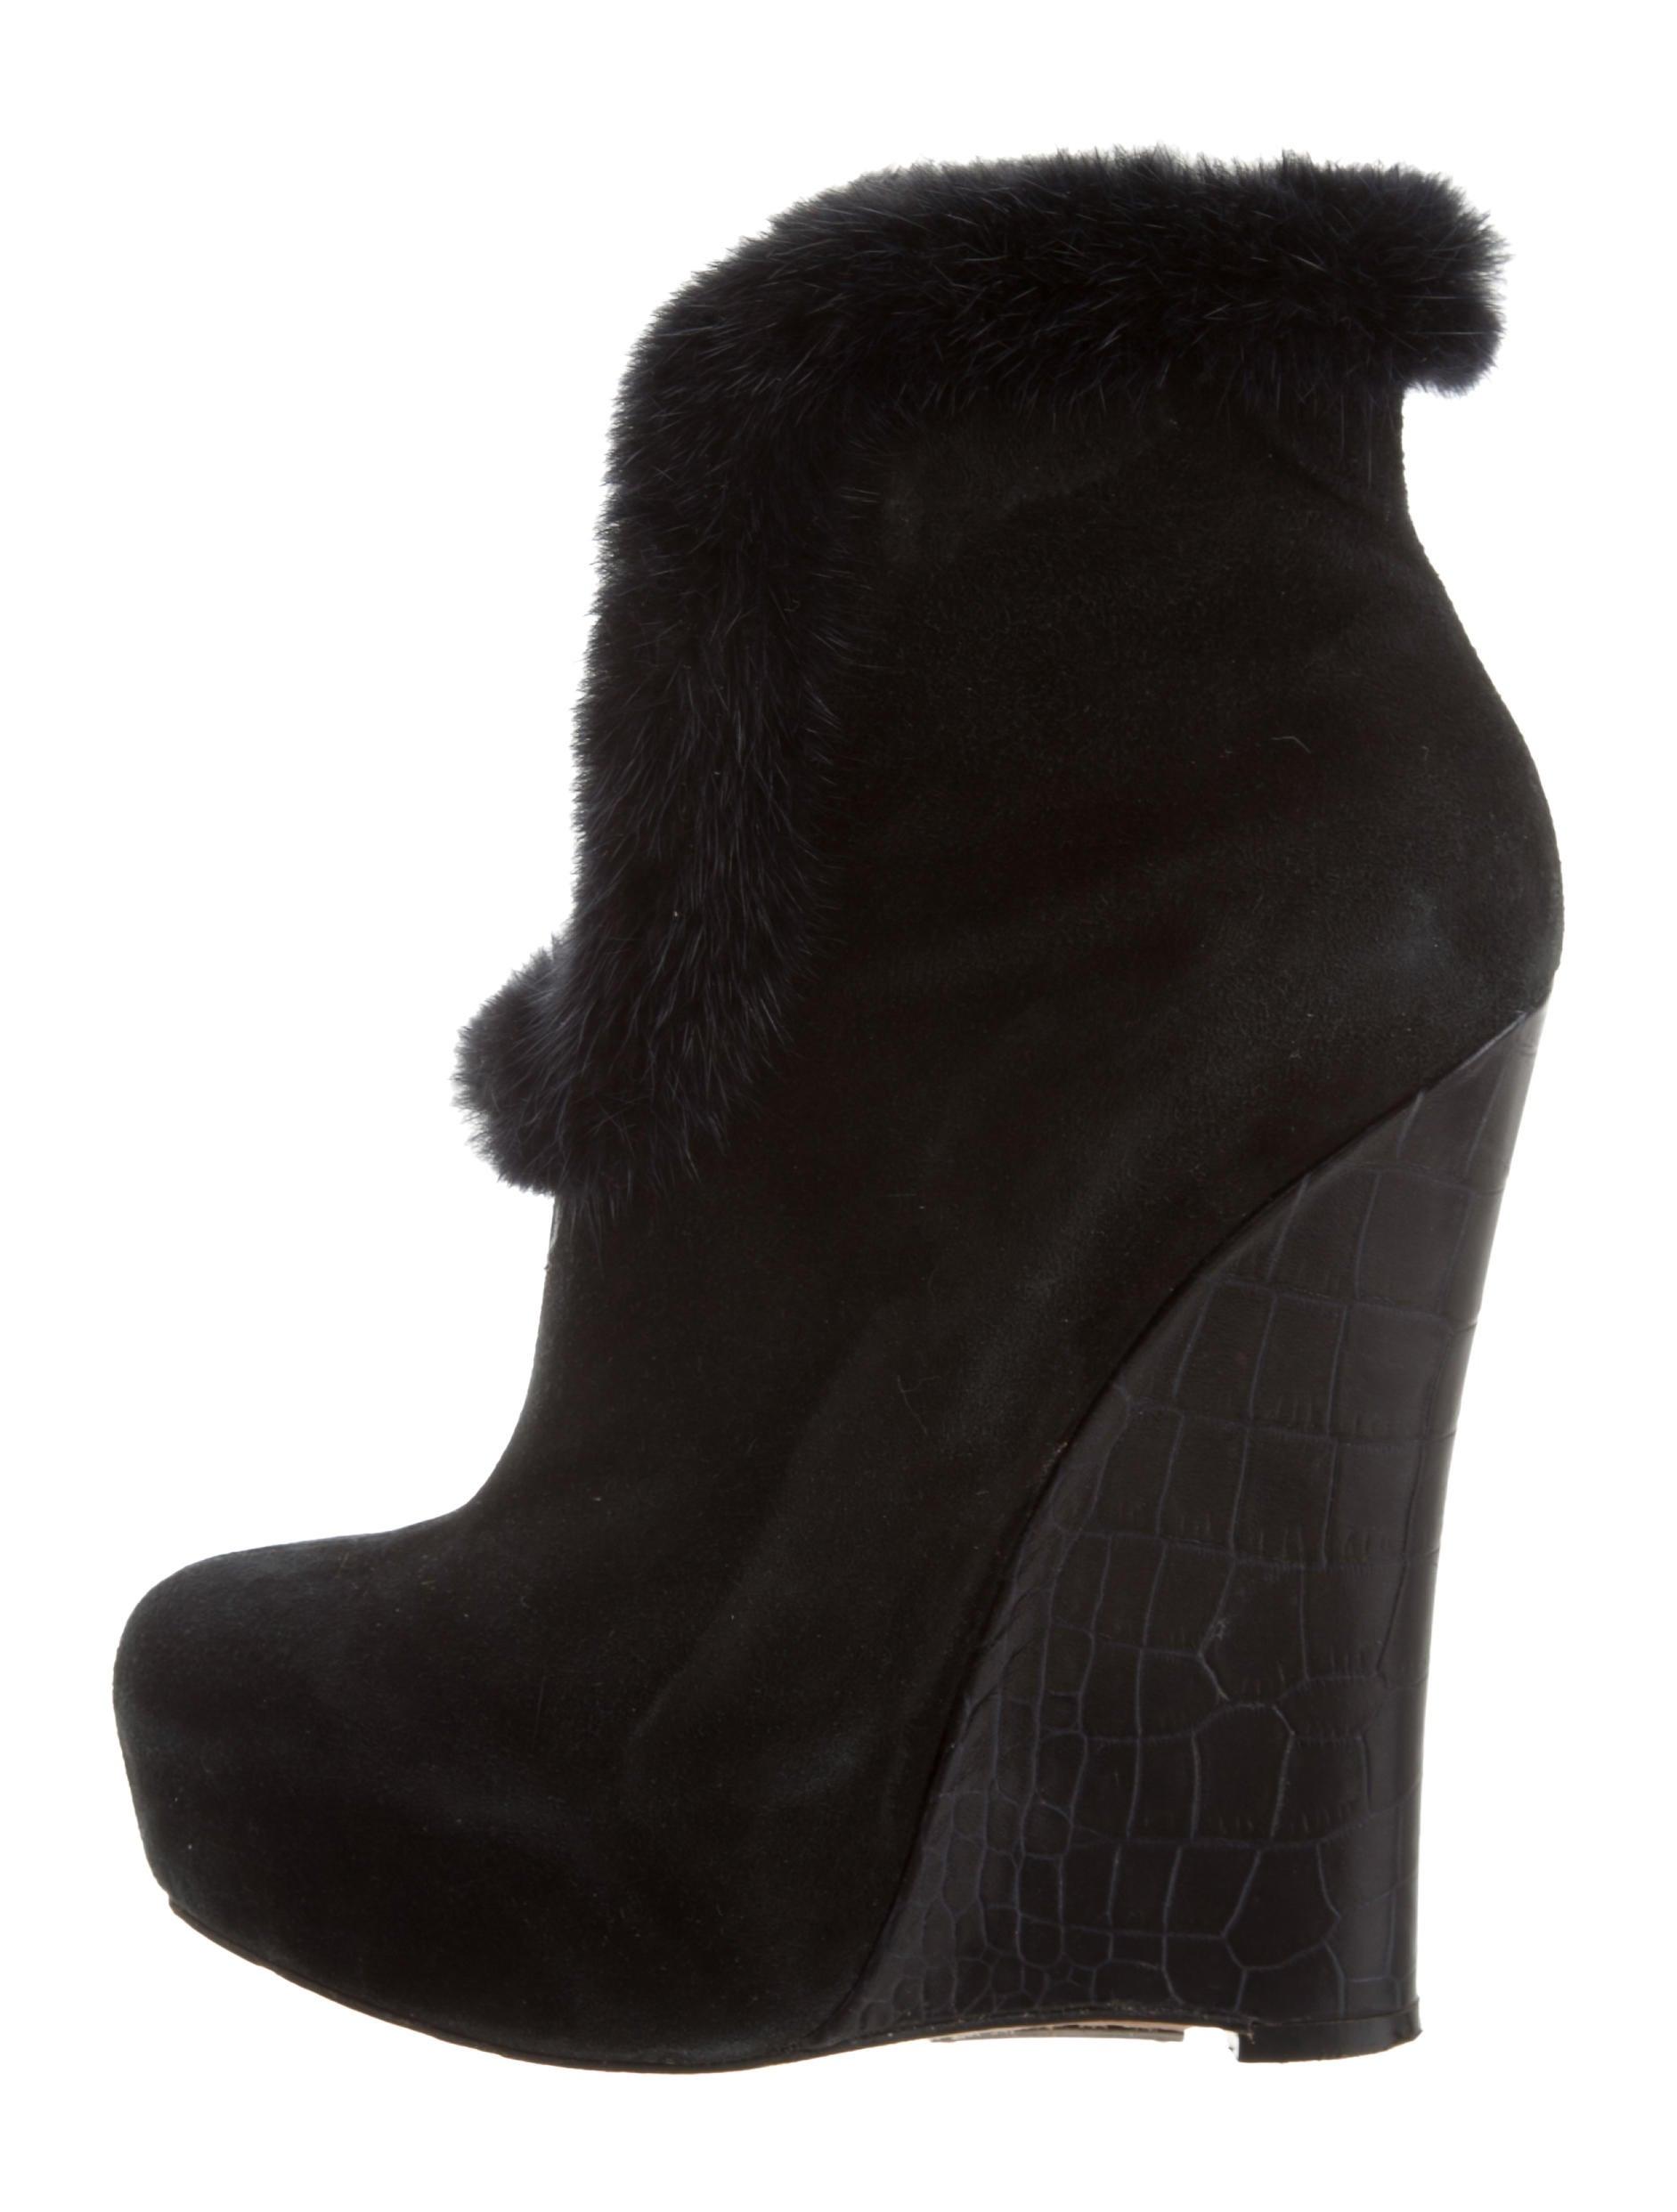 Alejandro Ingelmo Platform Fur-Trimmed Ankle Boots sneakernews cheap latest qSJCyScnD